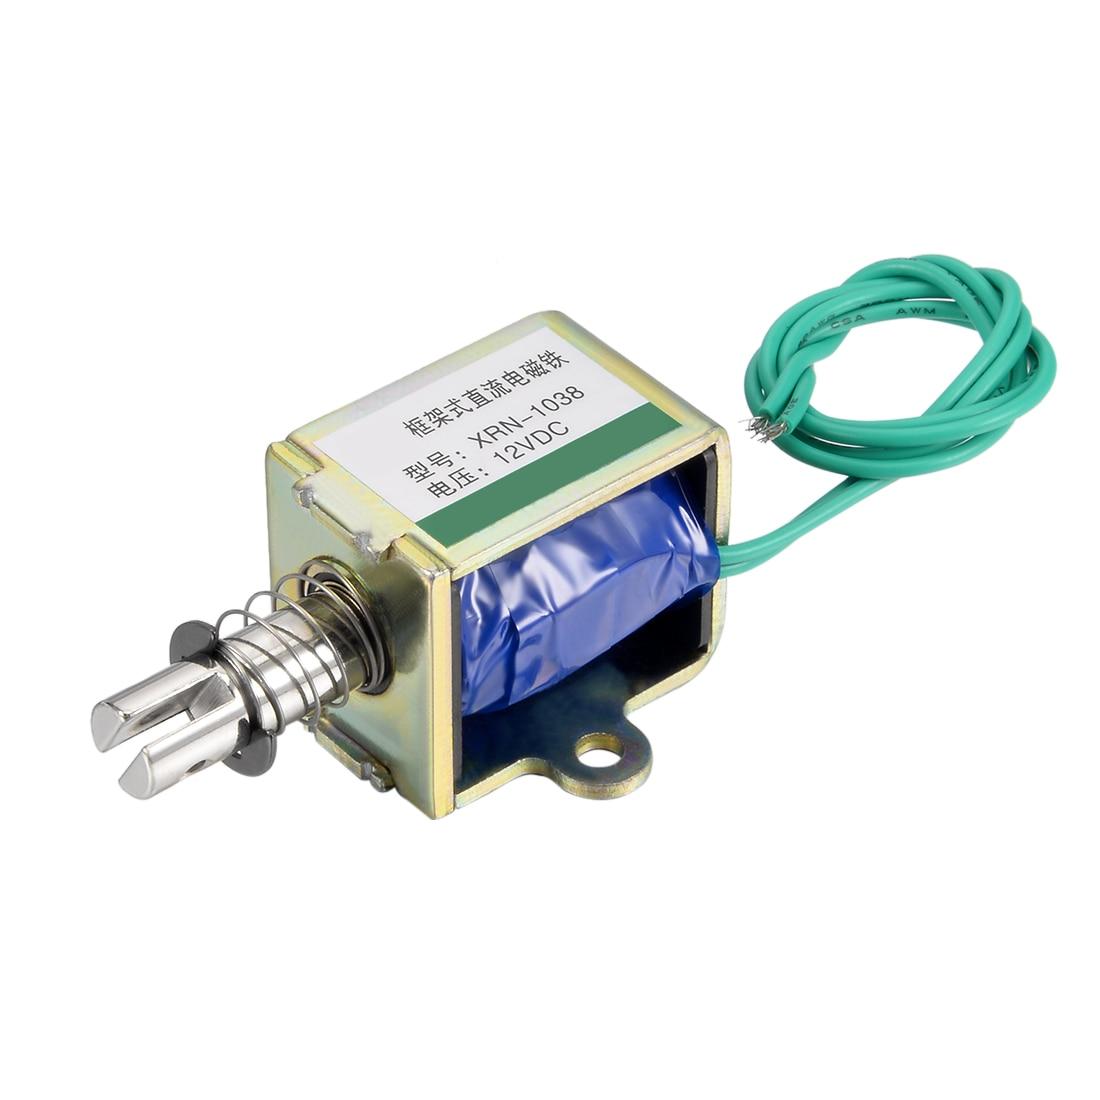 Uxcell XRN-1038 DC 12V 20N 10mm Pull Push Type Open Frame Solenoid Electromagnet